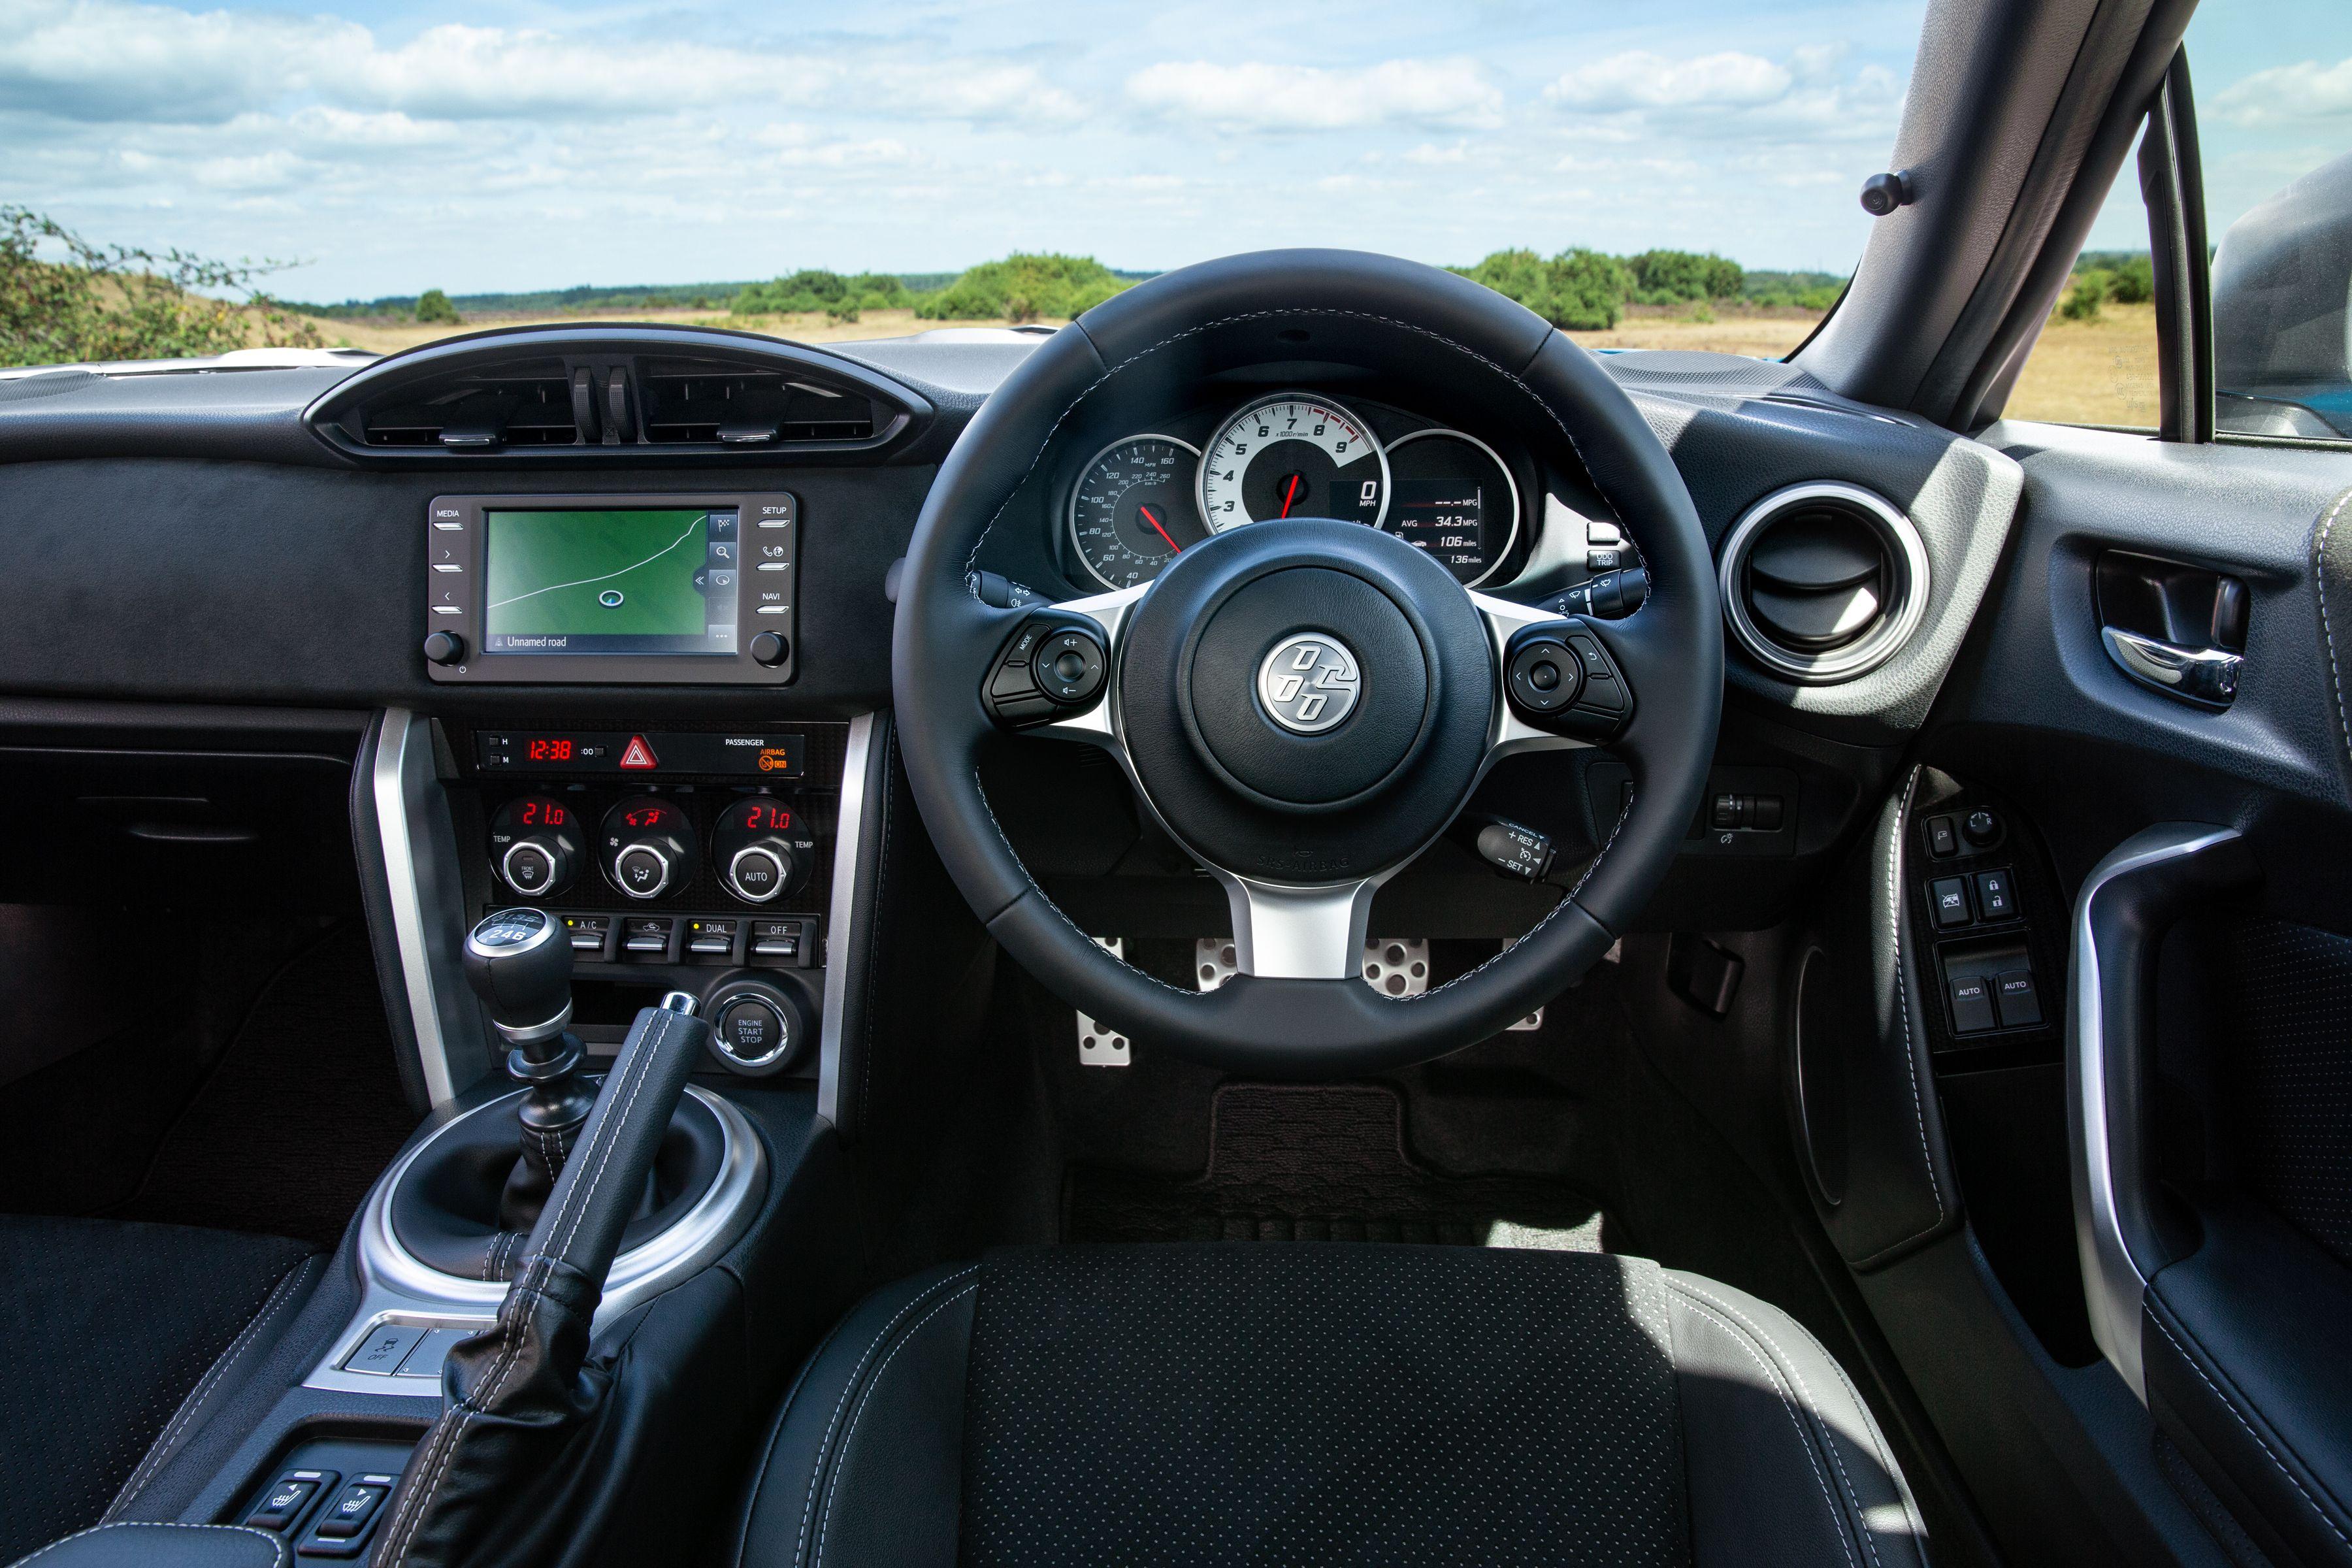 Interior of the Toyota